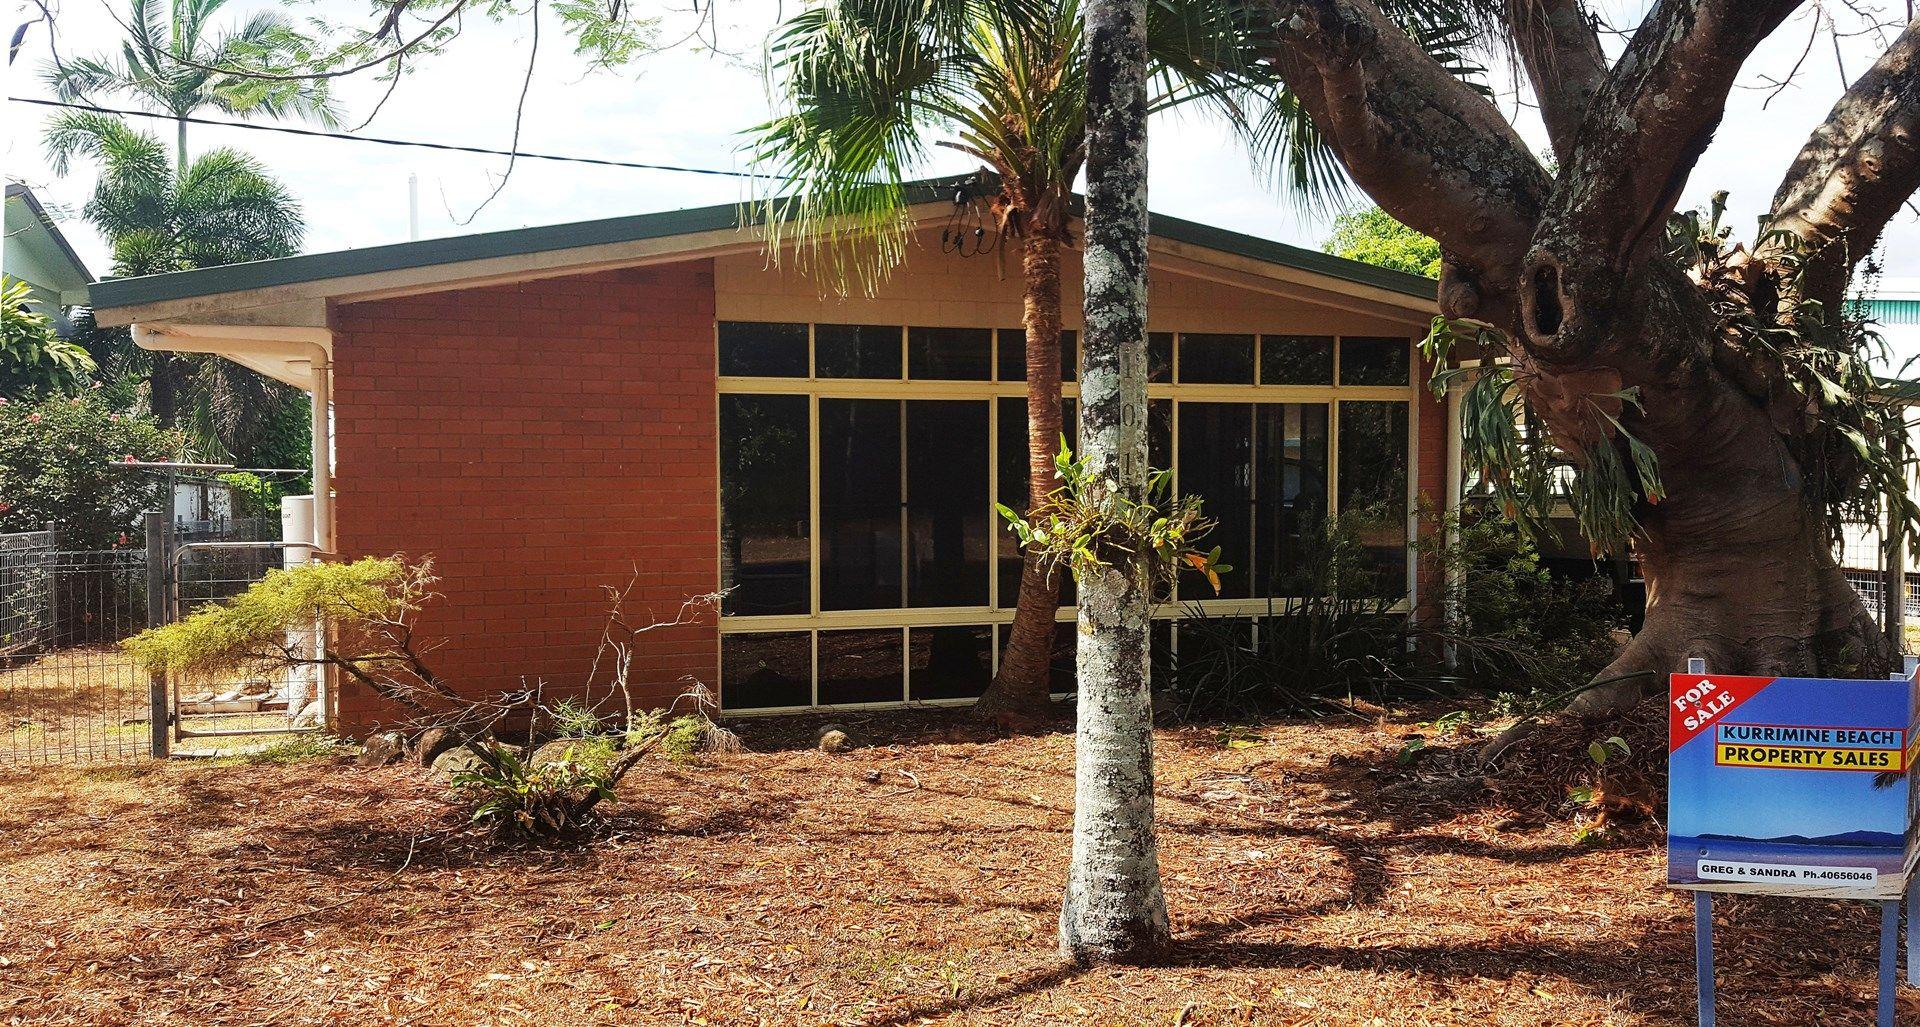 101 Jacobs Rd, Kurrimine Beach QLD 4871, Image 0